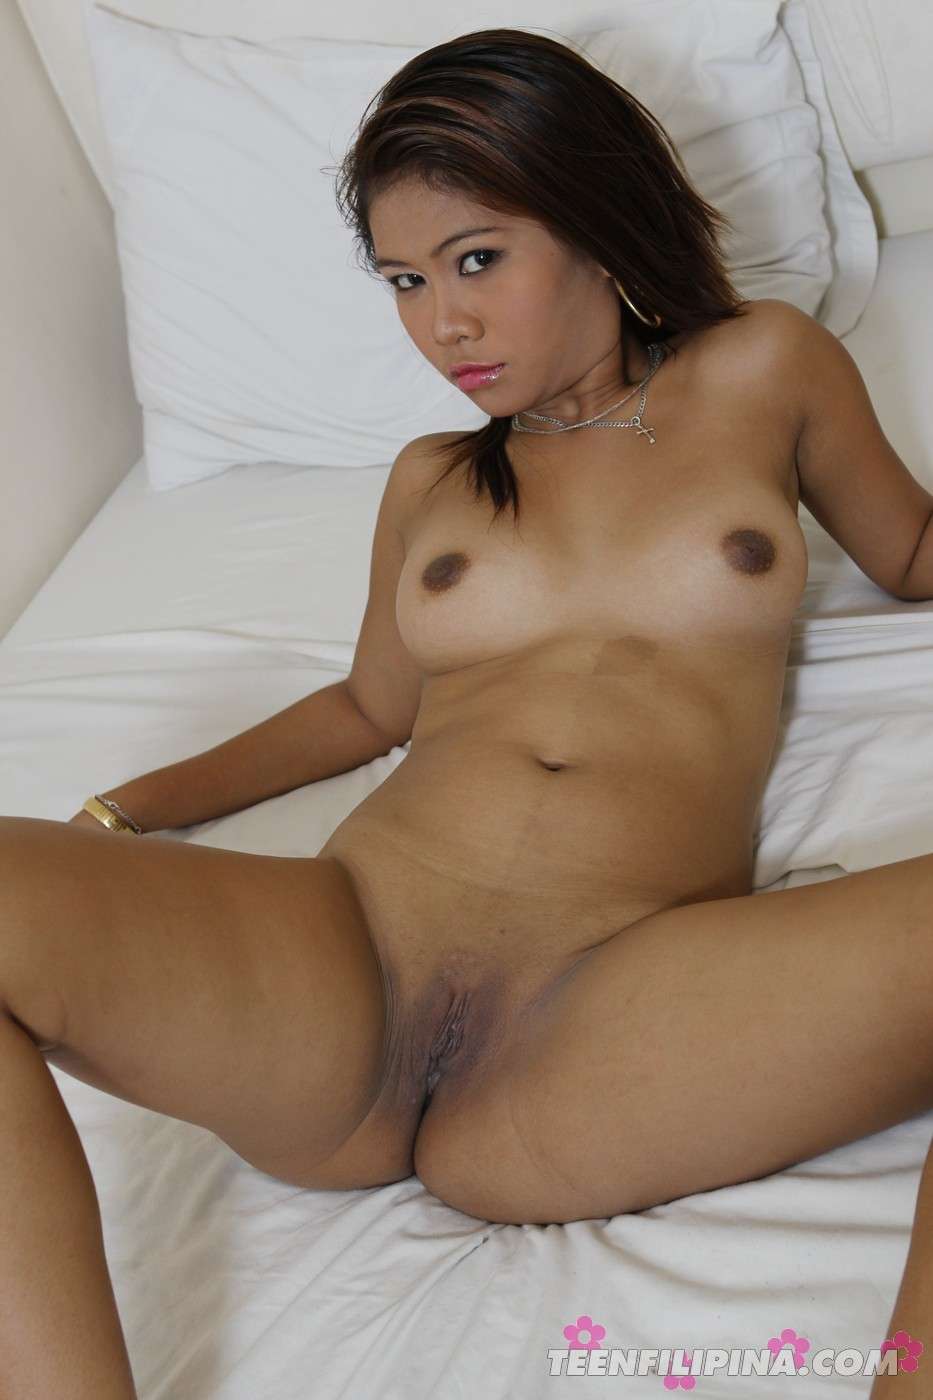 real nude woman raw photo